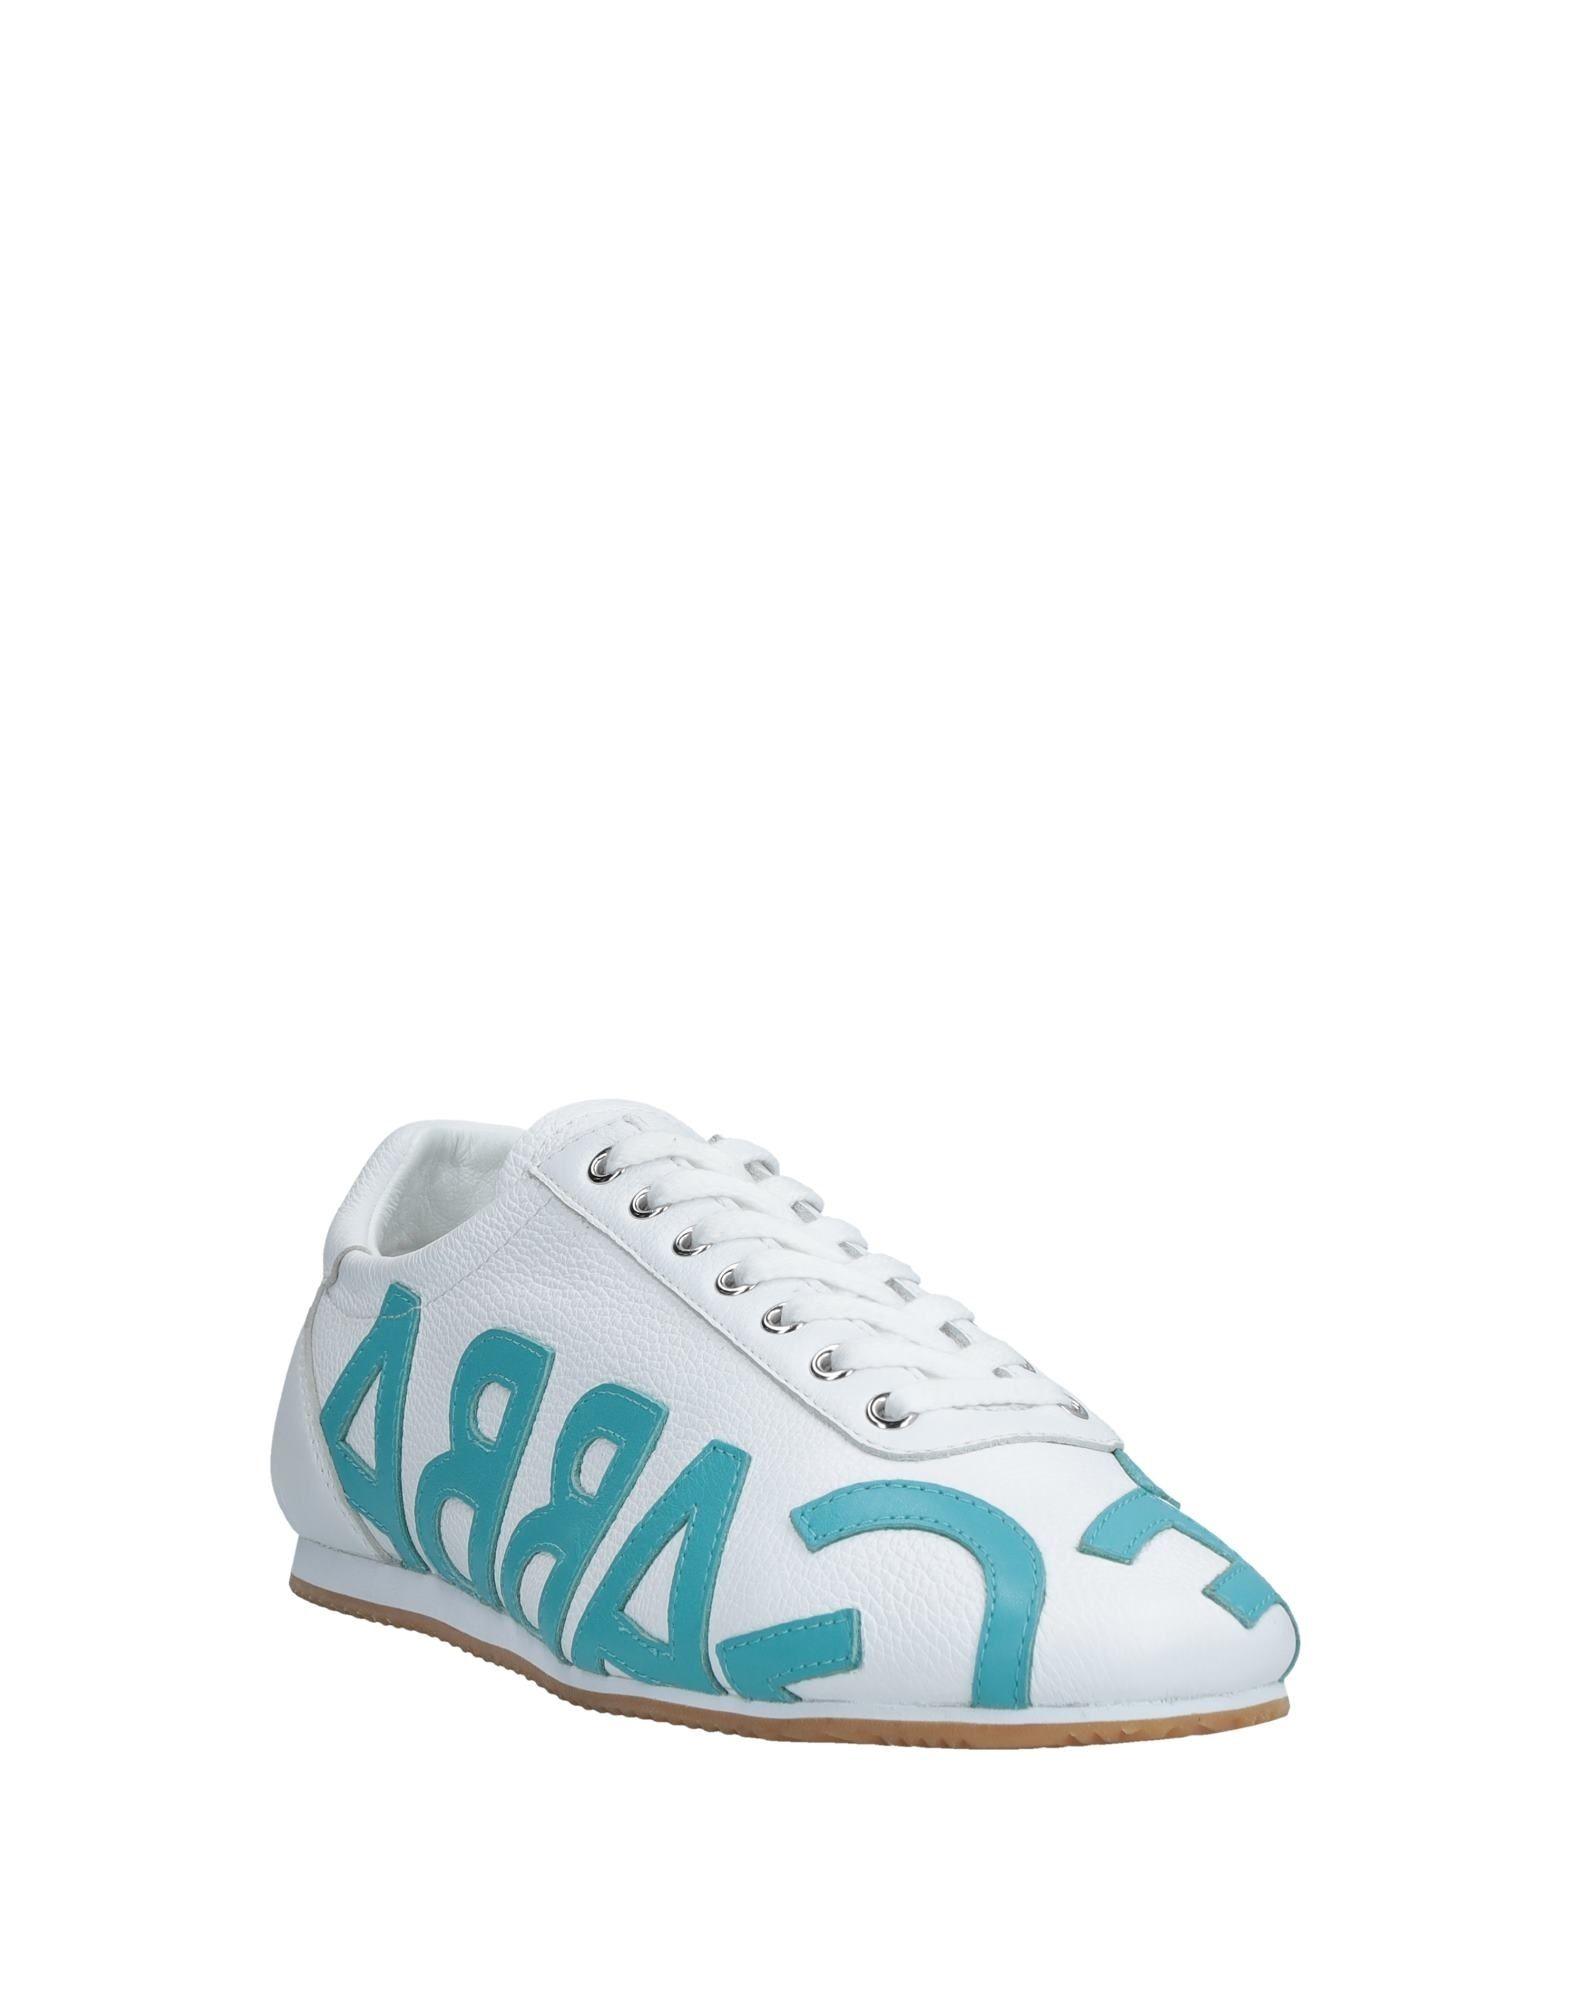 Dolce & Gabbana Sneakers Sneakers Gabbana Herren  11544021OO Gute Qualität beliebte Schuhe a9f6dc